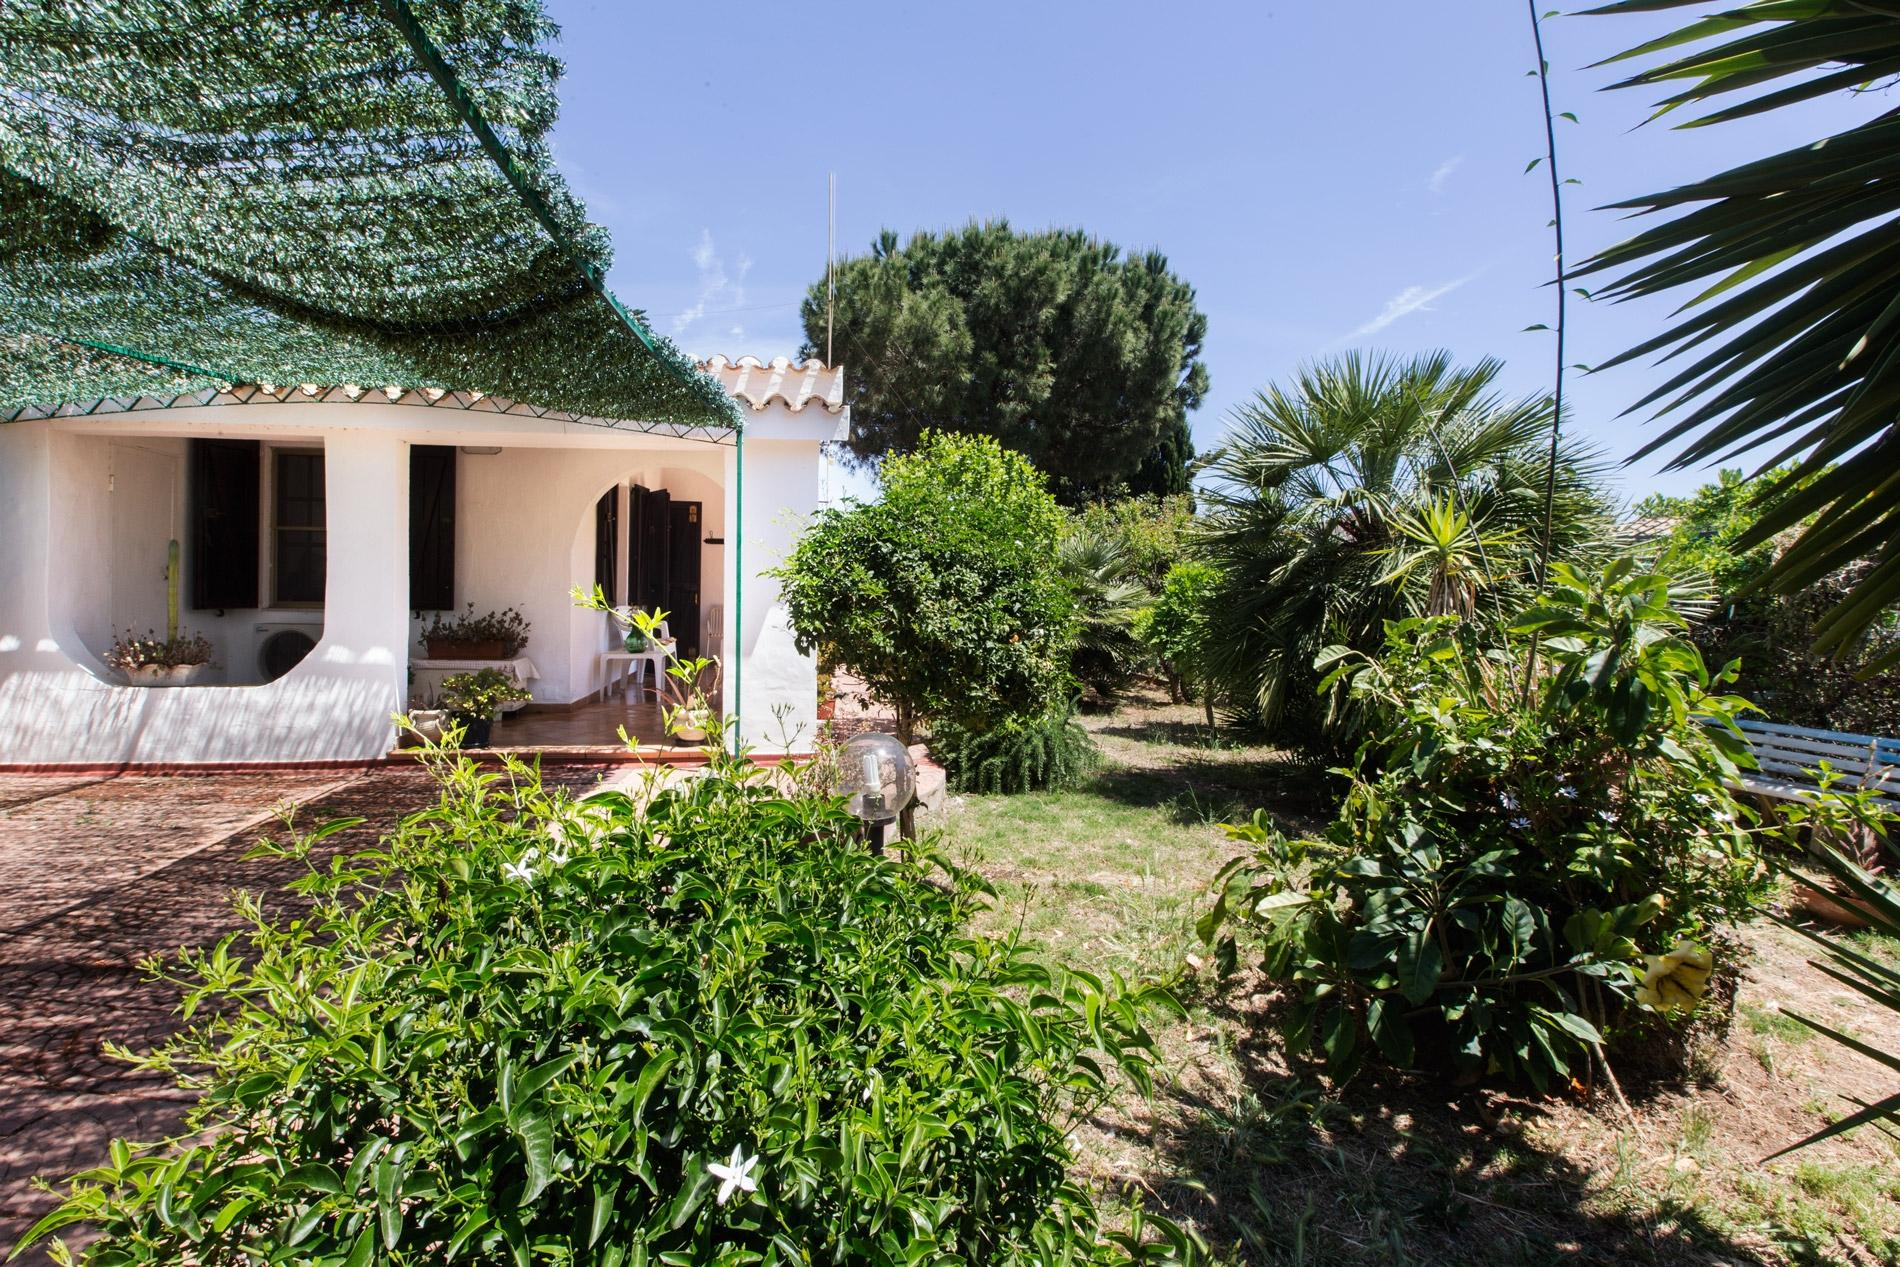 Location Vacances Sud Sardaigne Villa Vacances Bord de Mer Porto Columbu Pula